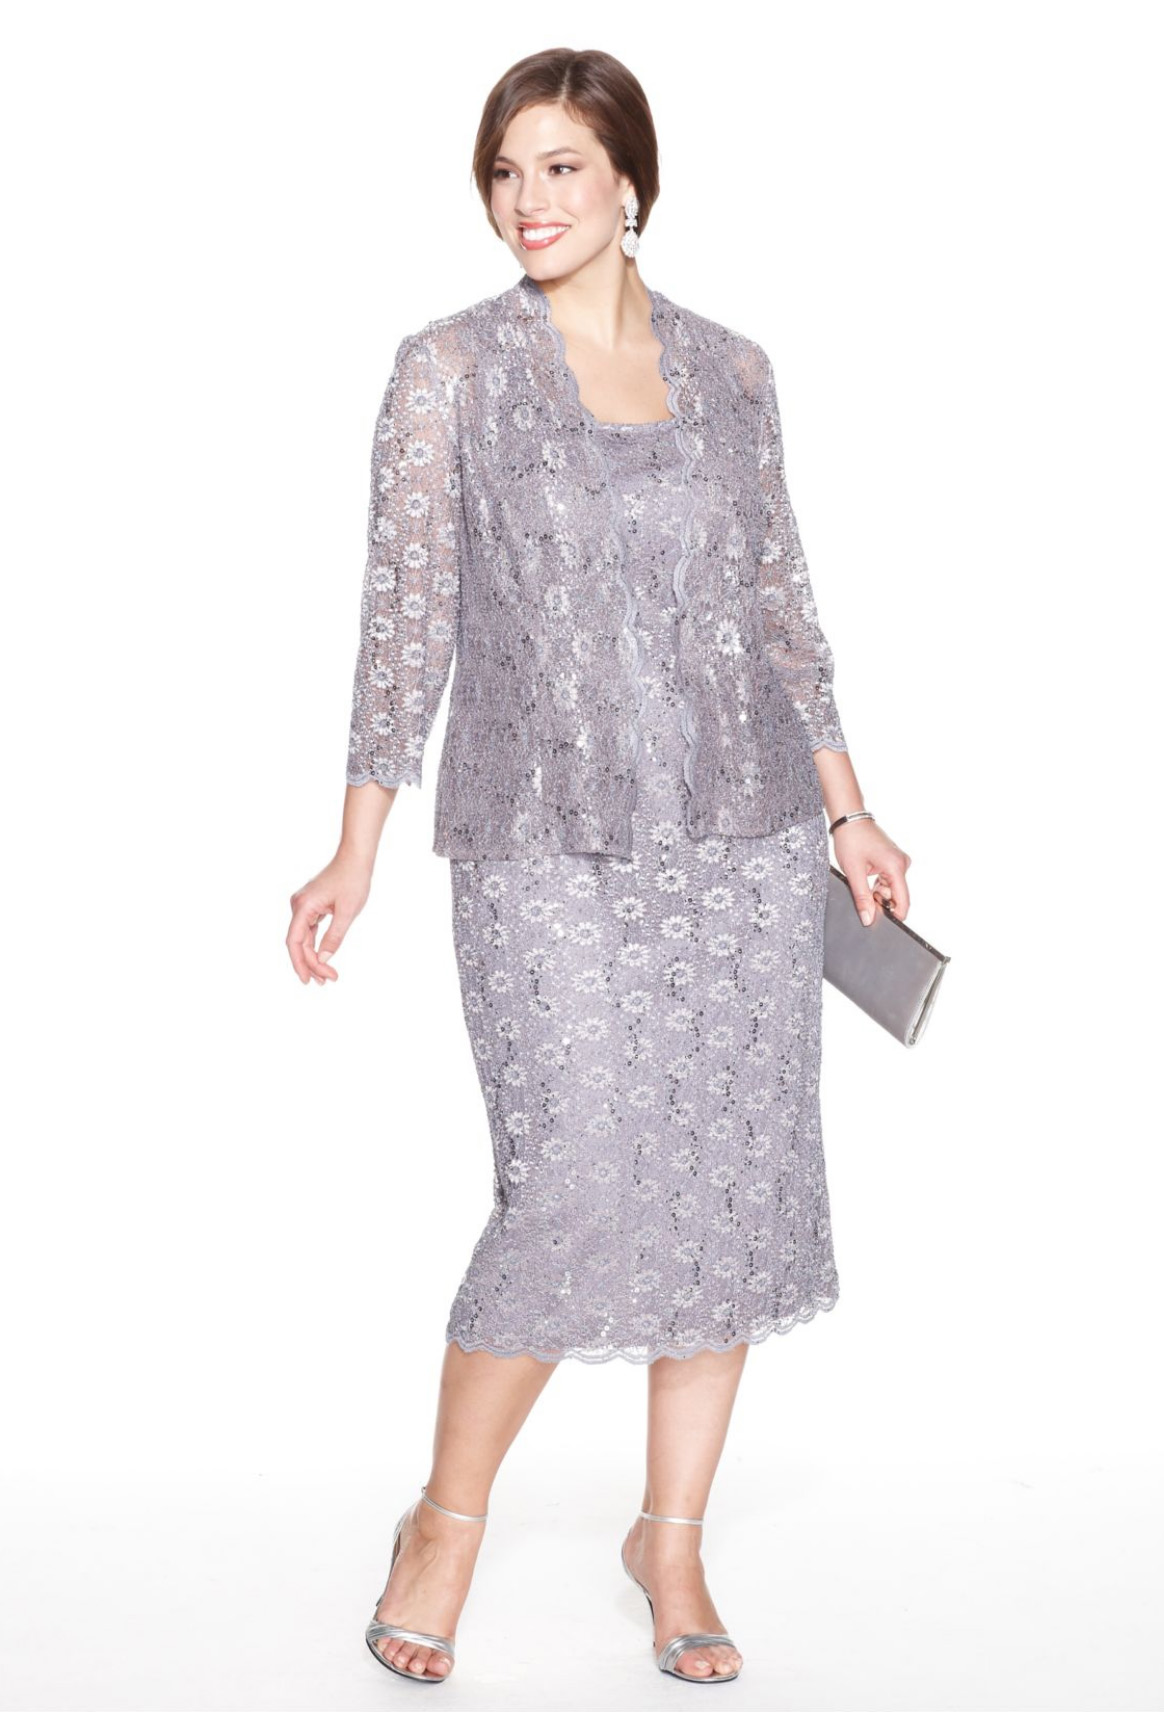 Plus Size Elegant Latest Fashion Lace Mother Of The Bride